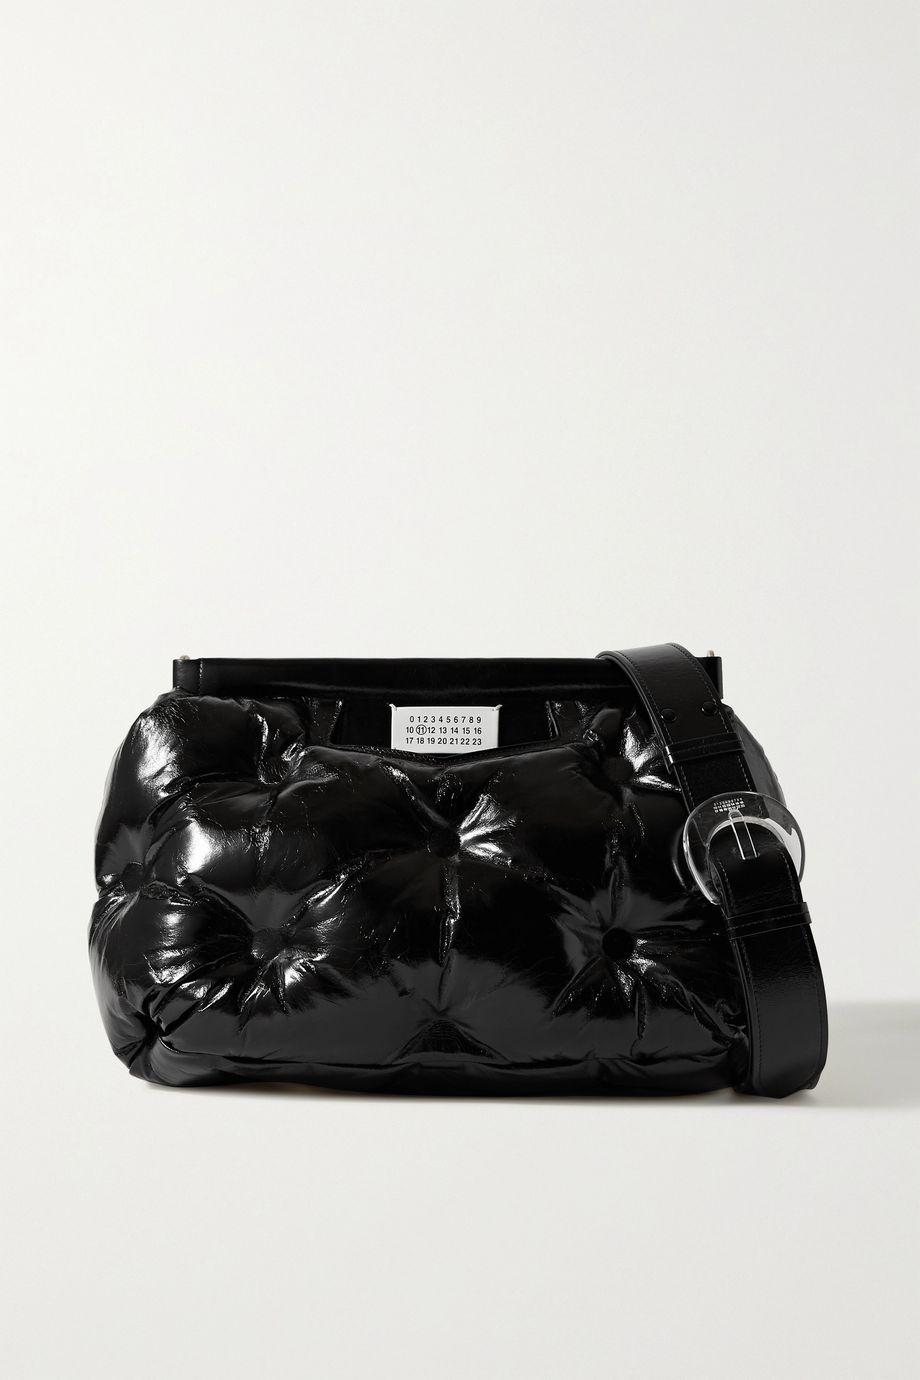 Maison Margiela Pillow 绗缝褶皱亮面皮革单肩包